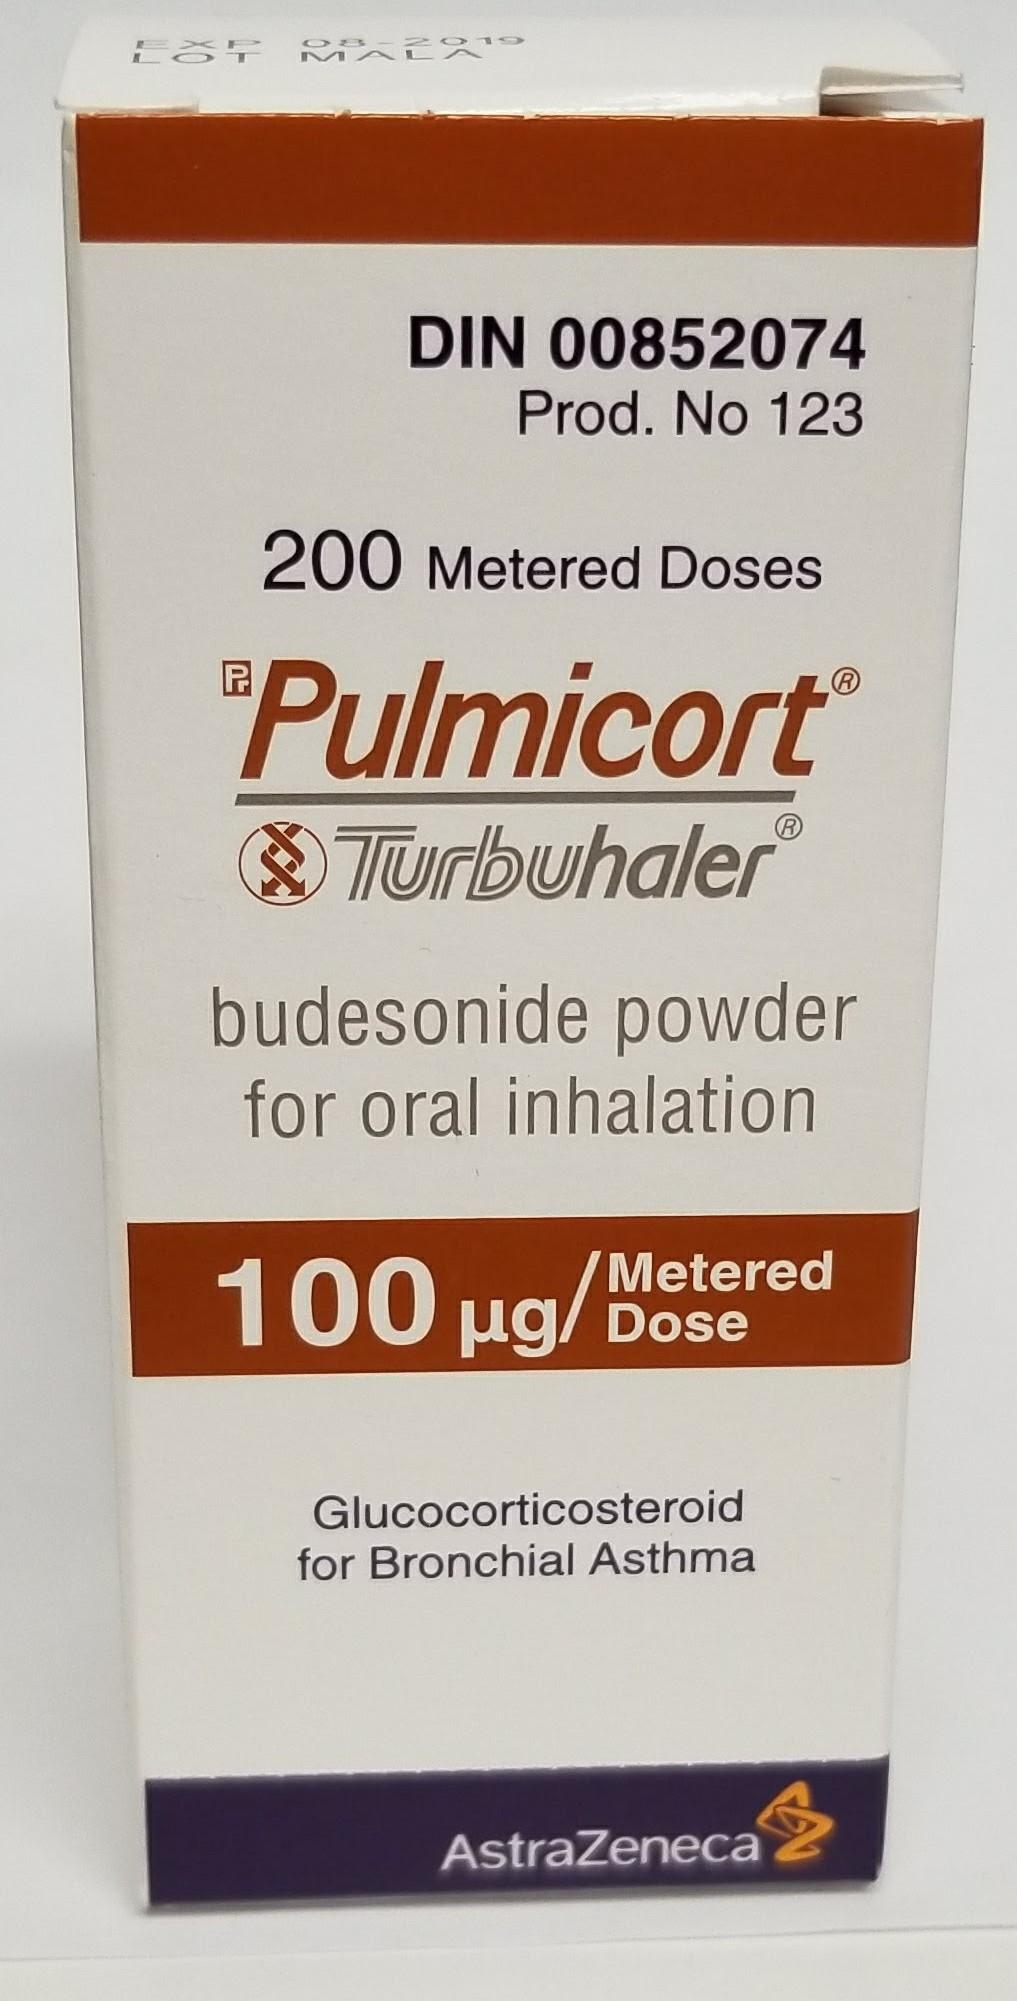 Buy Pulmicort Turbuhaler Online